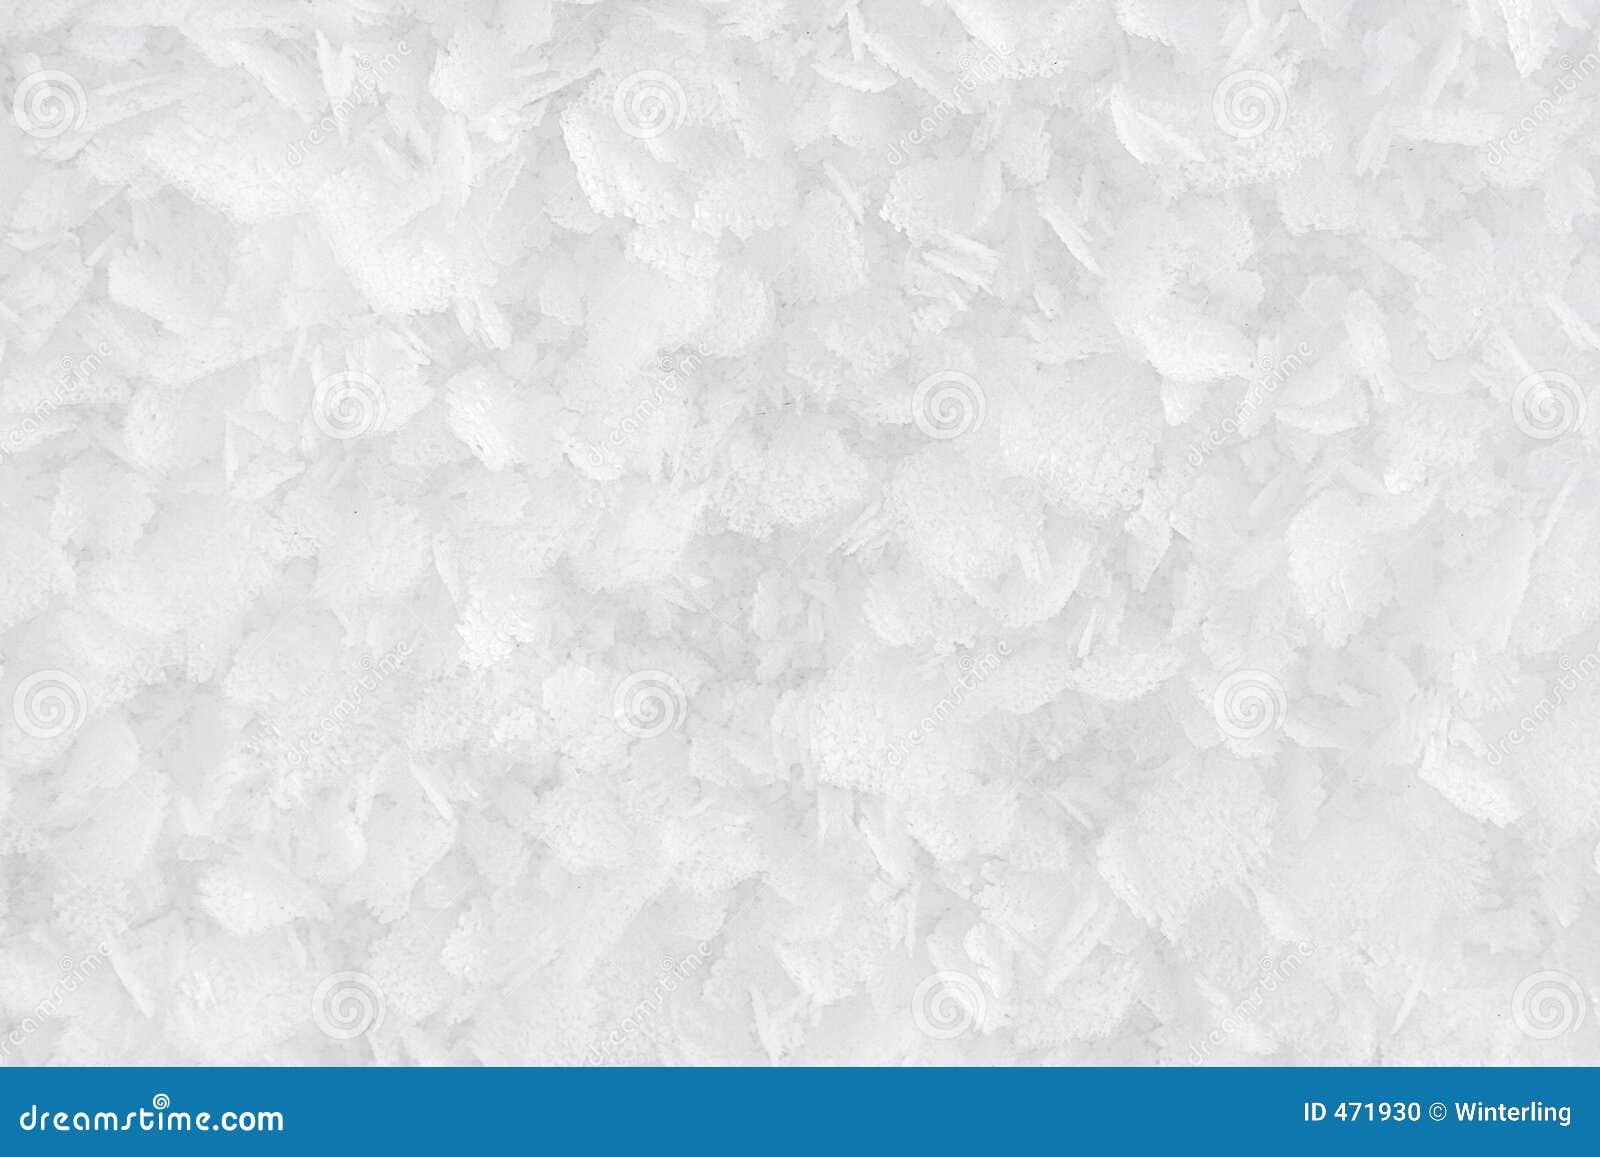 Textures – Snowflakes (Close)